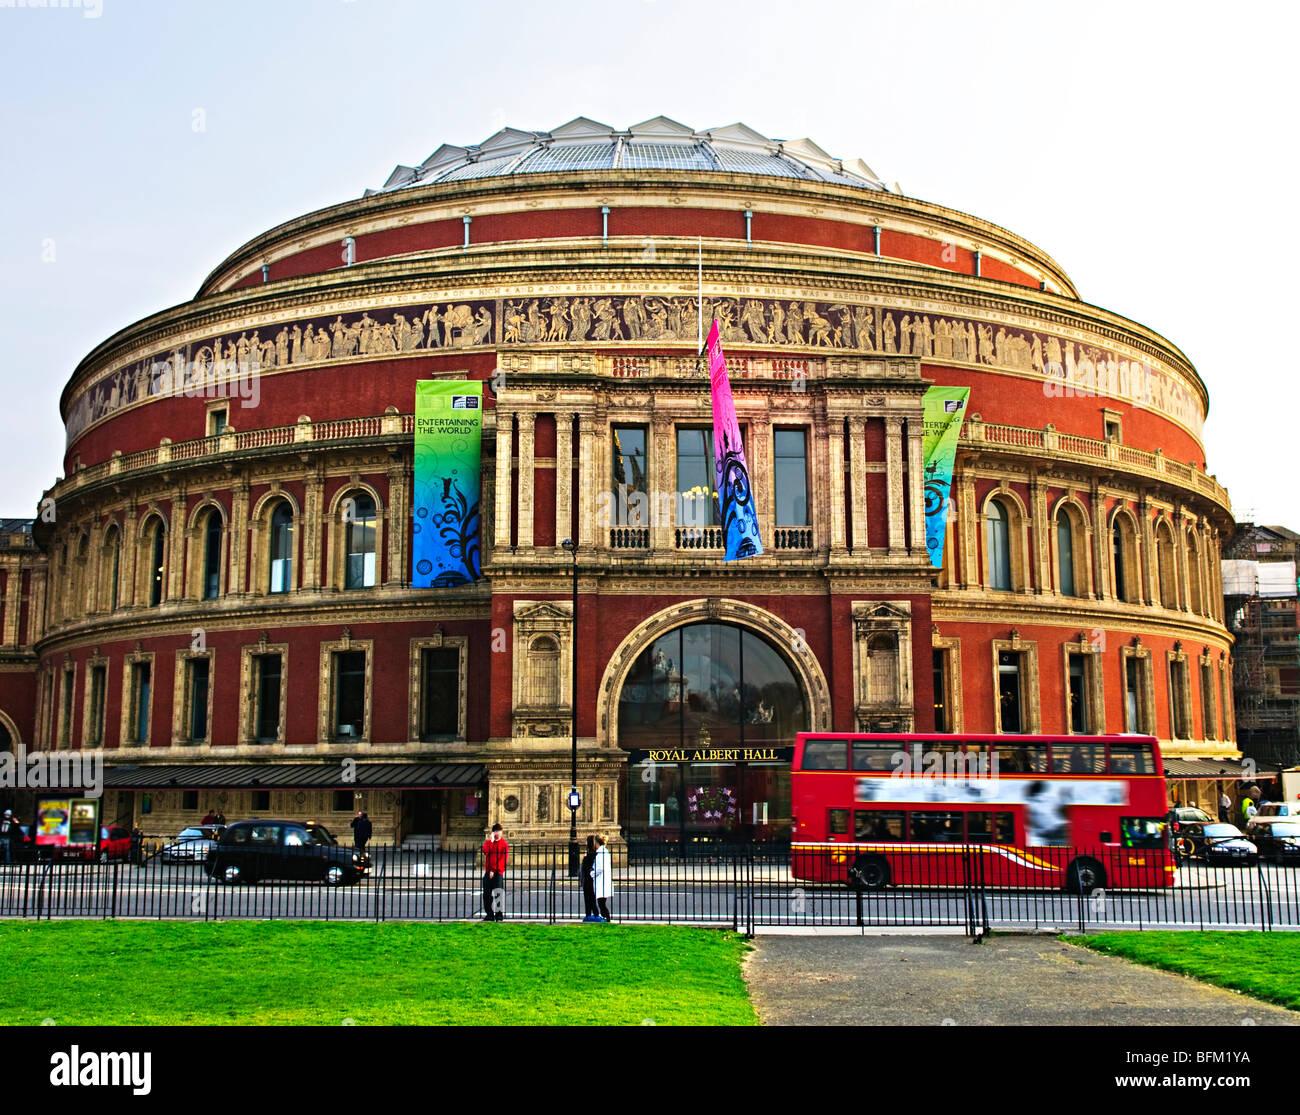 Royal Albert Hall building in London England - Stock Image